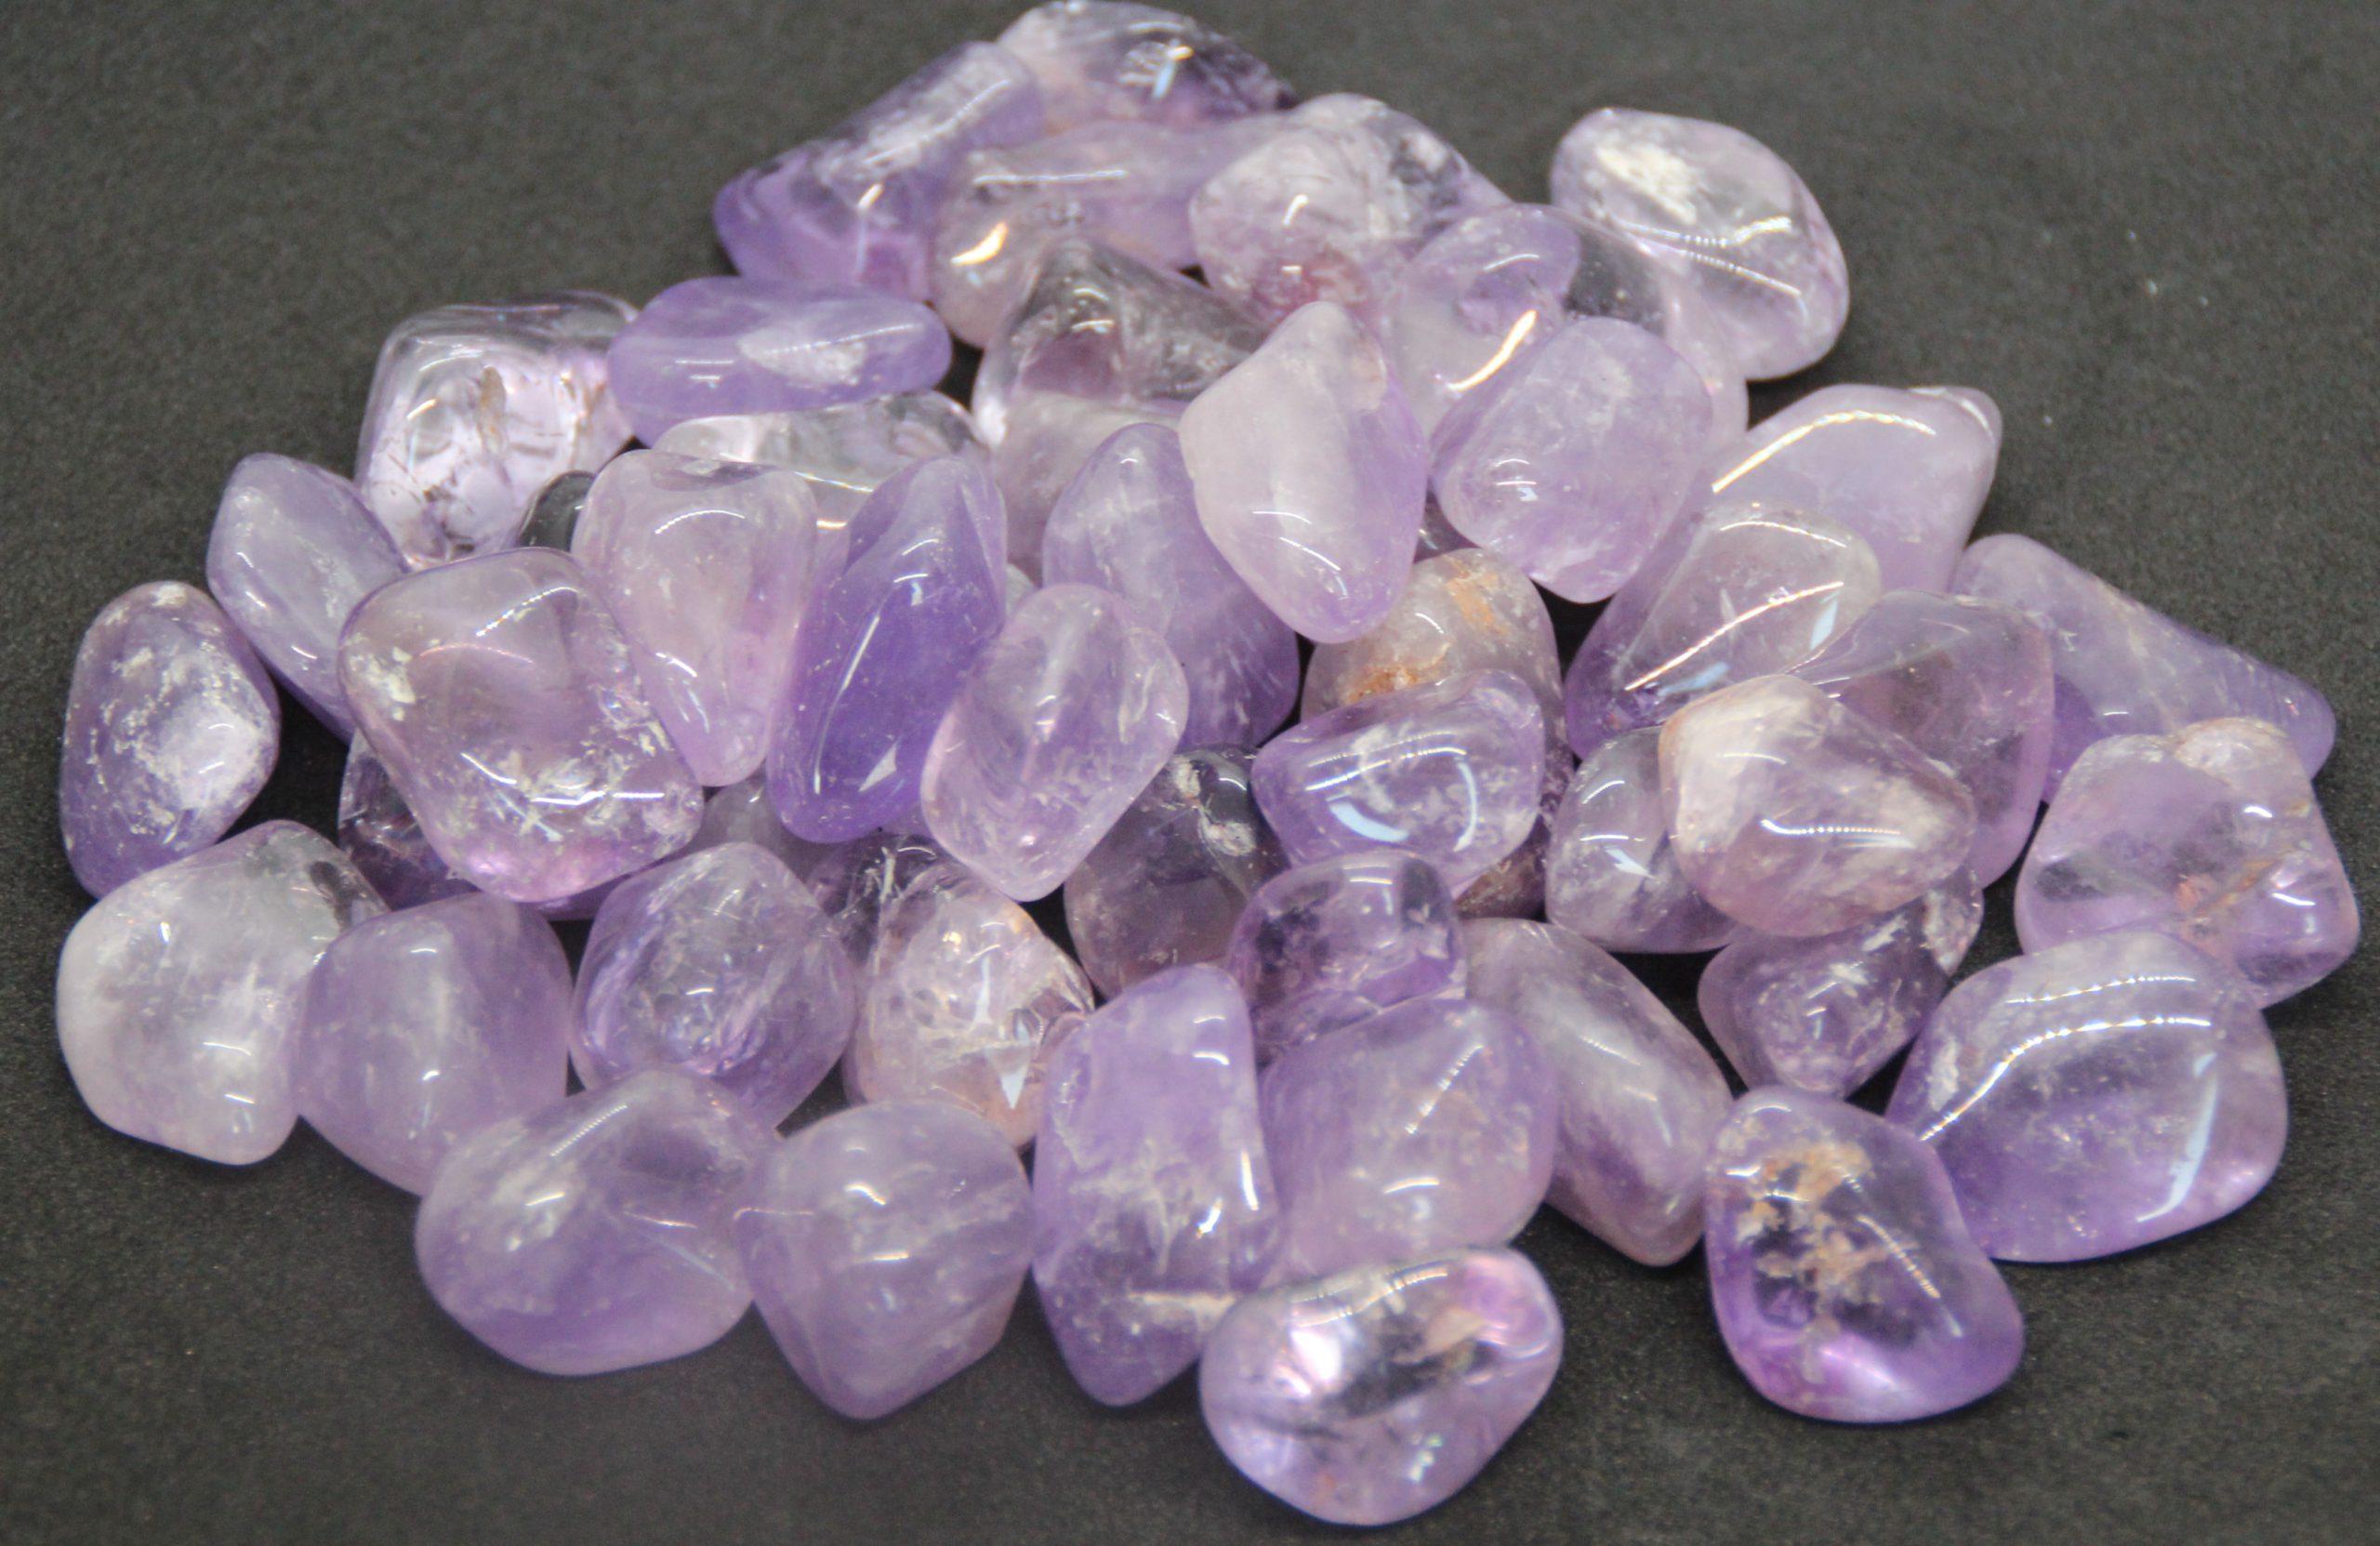 amethyste-du-bresil-pierres-roulees-shiva-esoterisme-lithotherapie-halluin-menen-paris-lille-nice-nimes